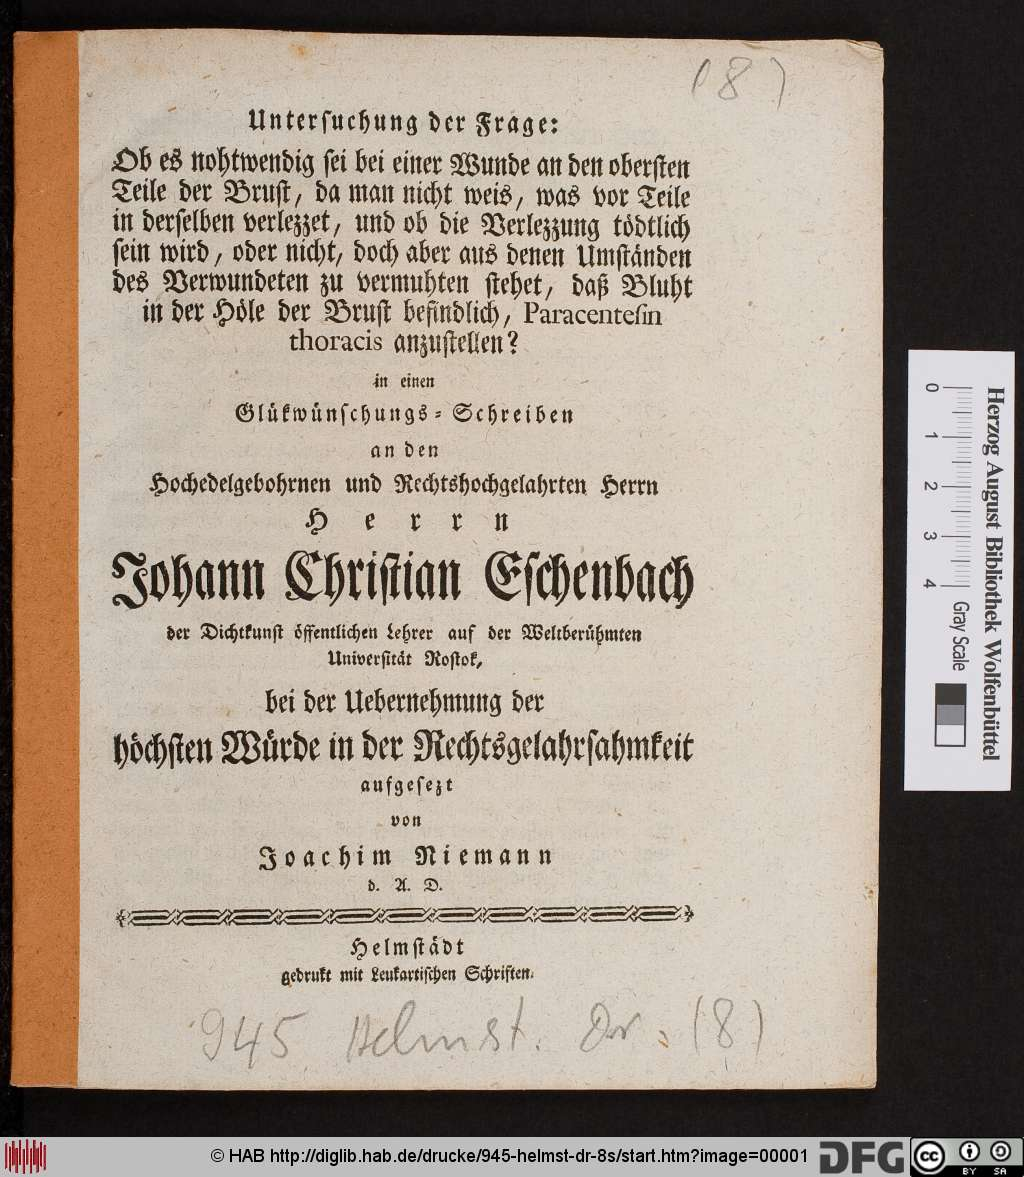 https://diglib.hab.de/drucke/945-helmst-dr-8s/00001.jpg